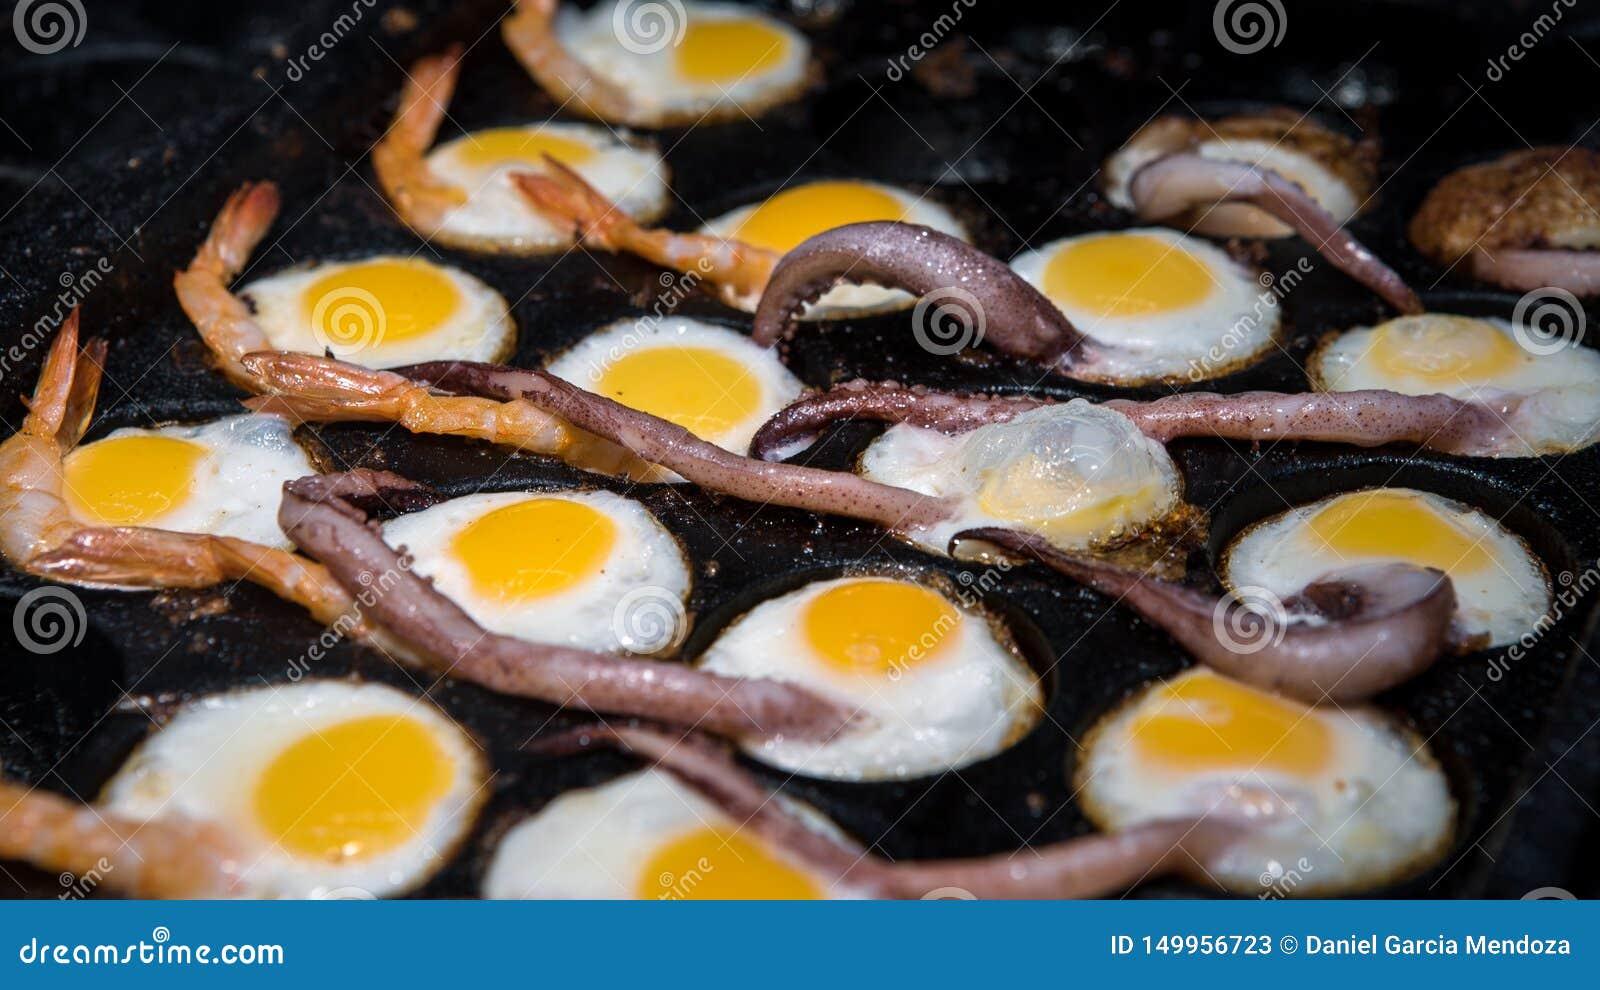 A street vendor prepare fried quail eggs with squid tentacles and prawns